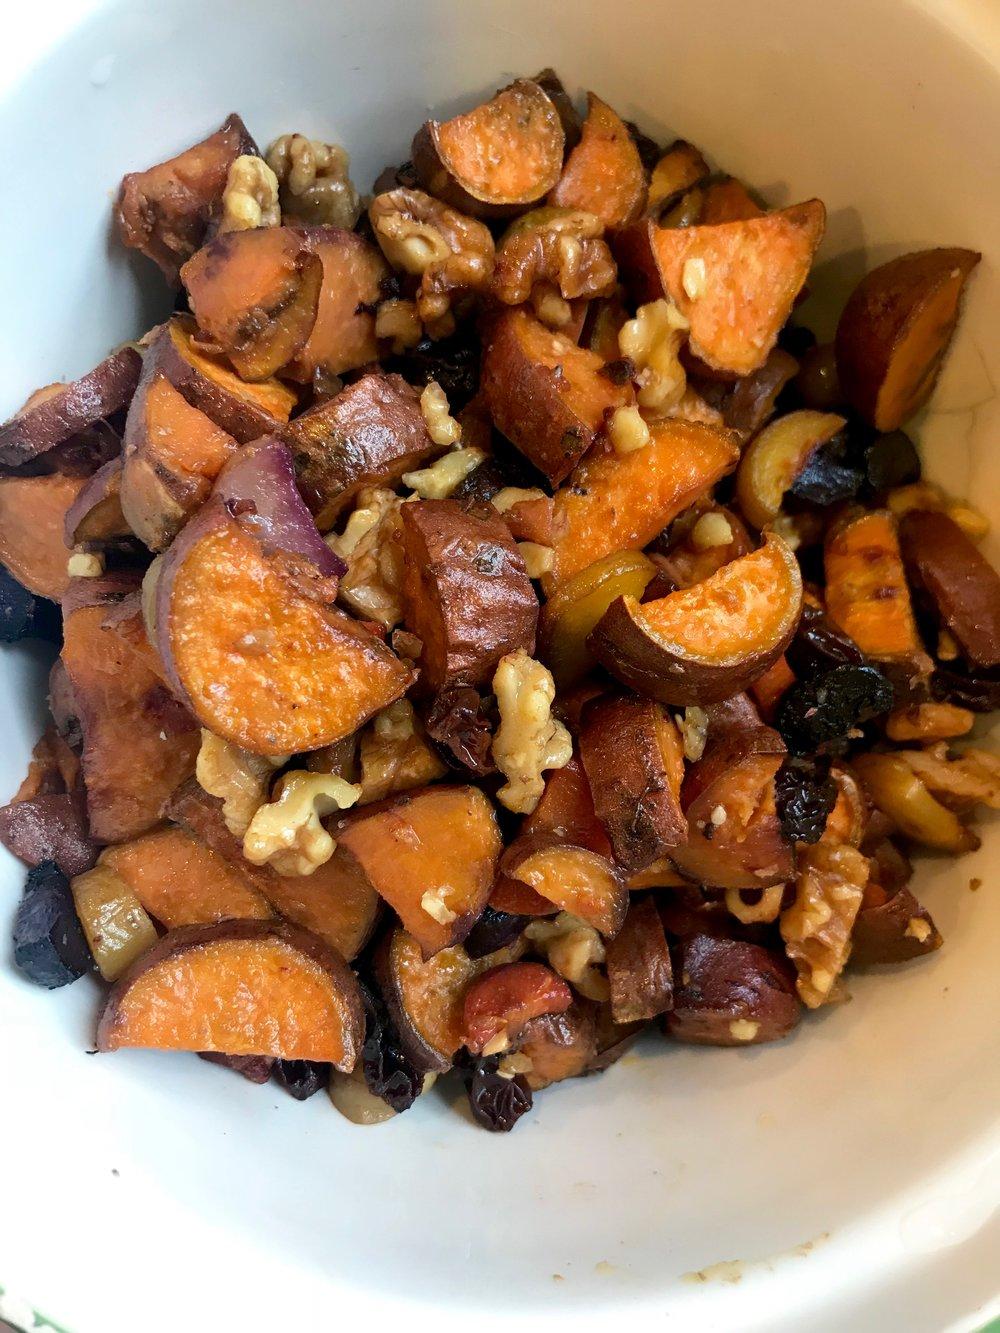 honey roasted sweet potato with Raisins and Walnuts